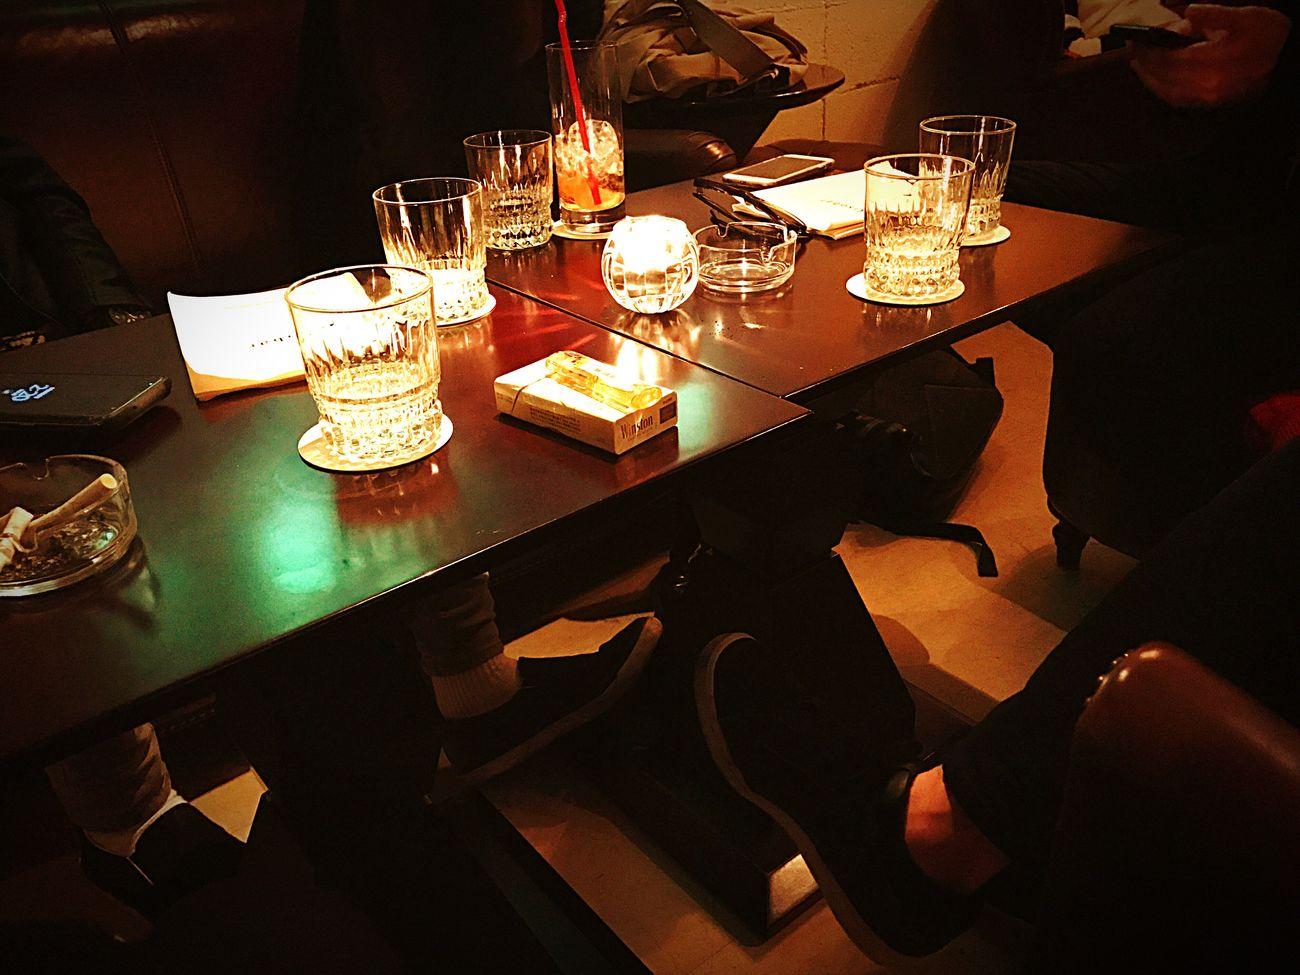 Table Drink Night Drinking Glass Indoors  Bar Nishiazabu Minatoku Alcohol Followme Like Happy Swag